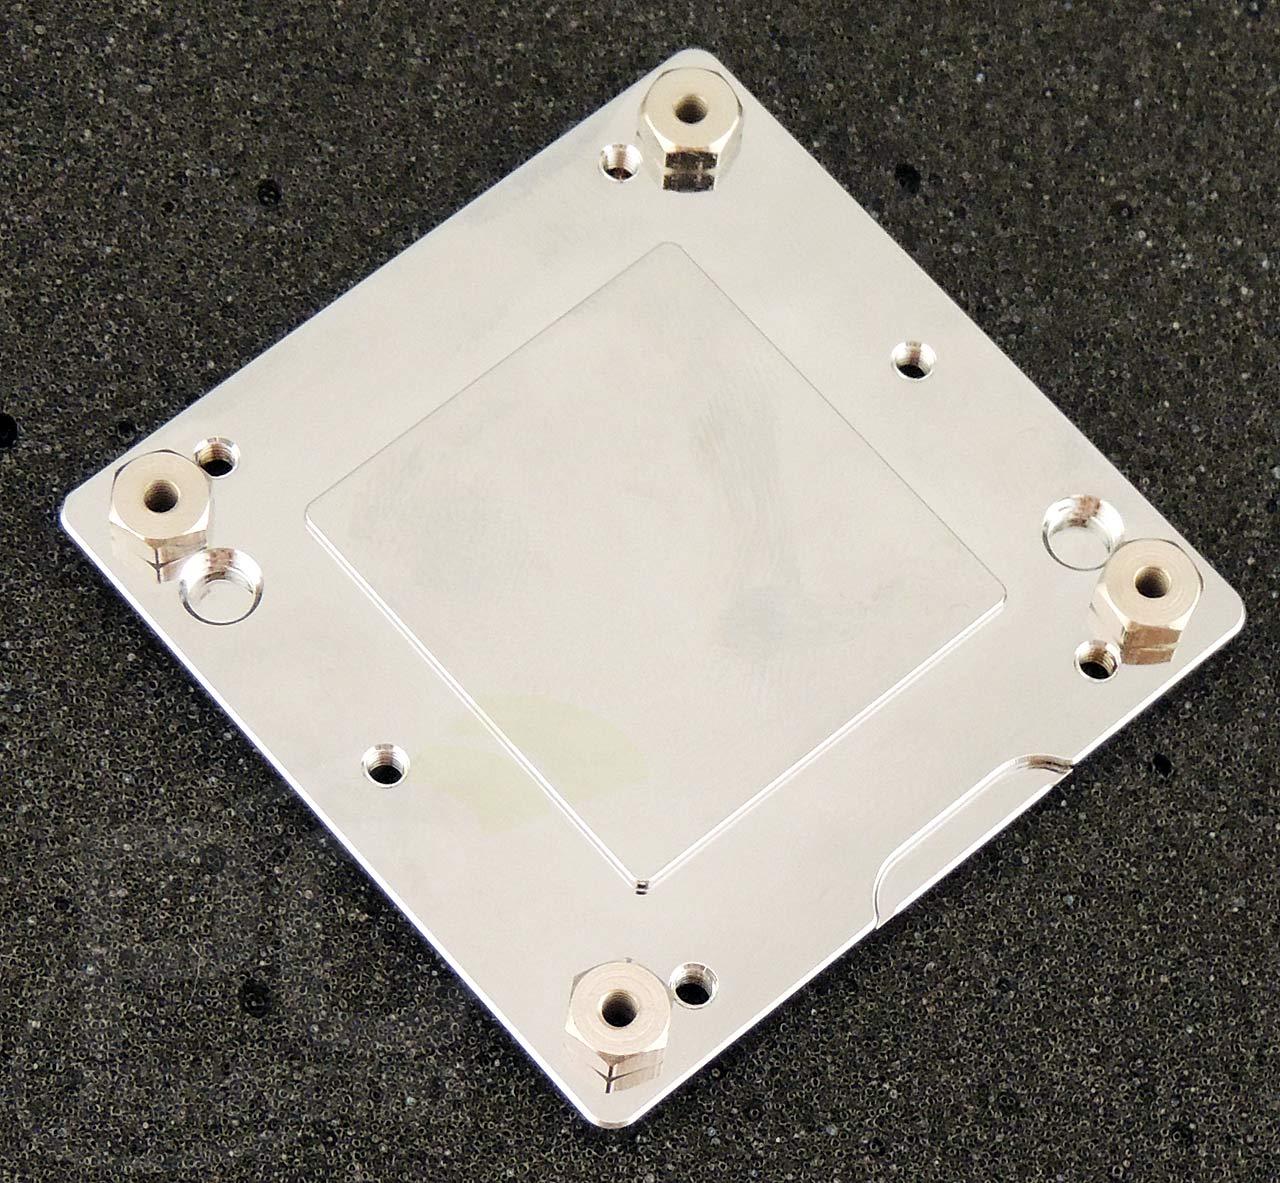 12-chipset-block-coolerplate-bottom.jpg